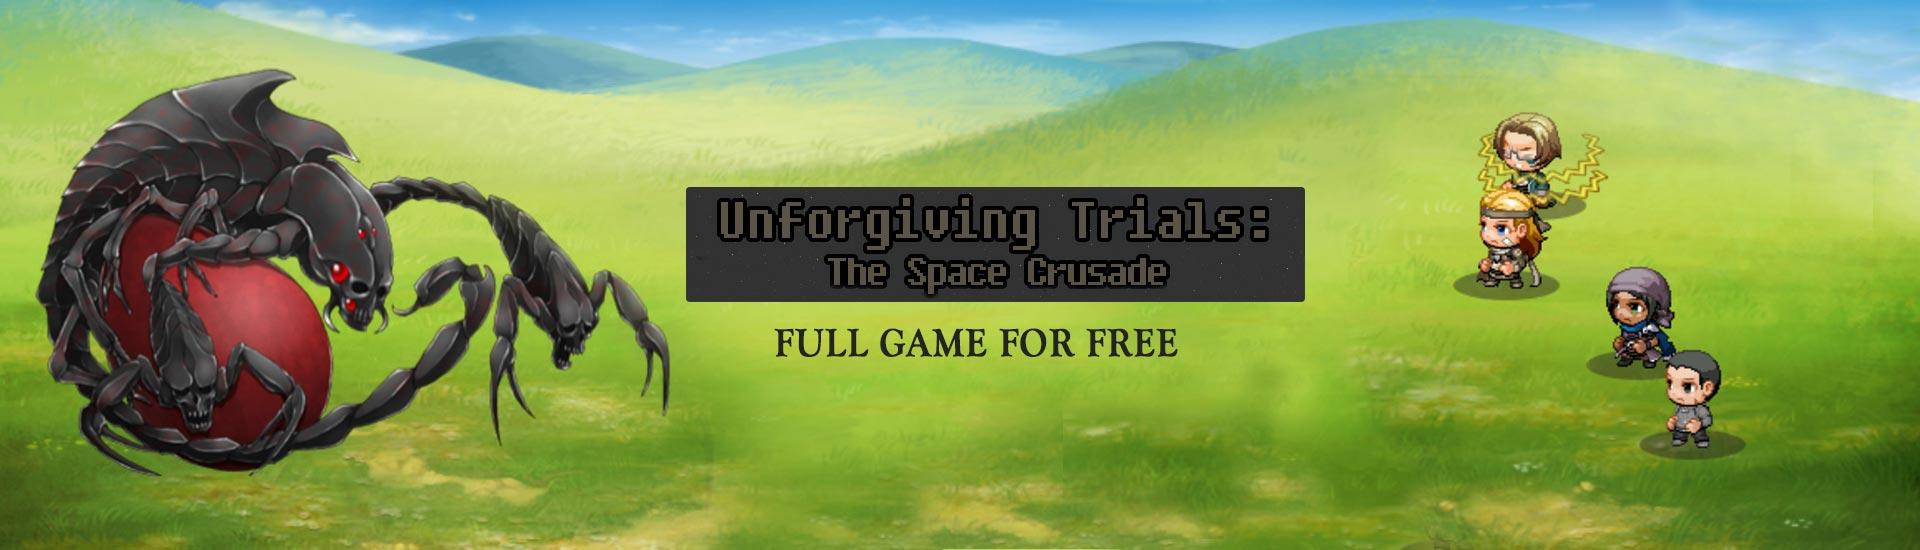 Unforgiving Trials: The Space Crusade cover